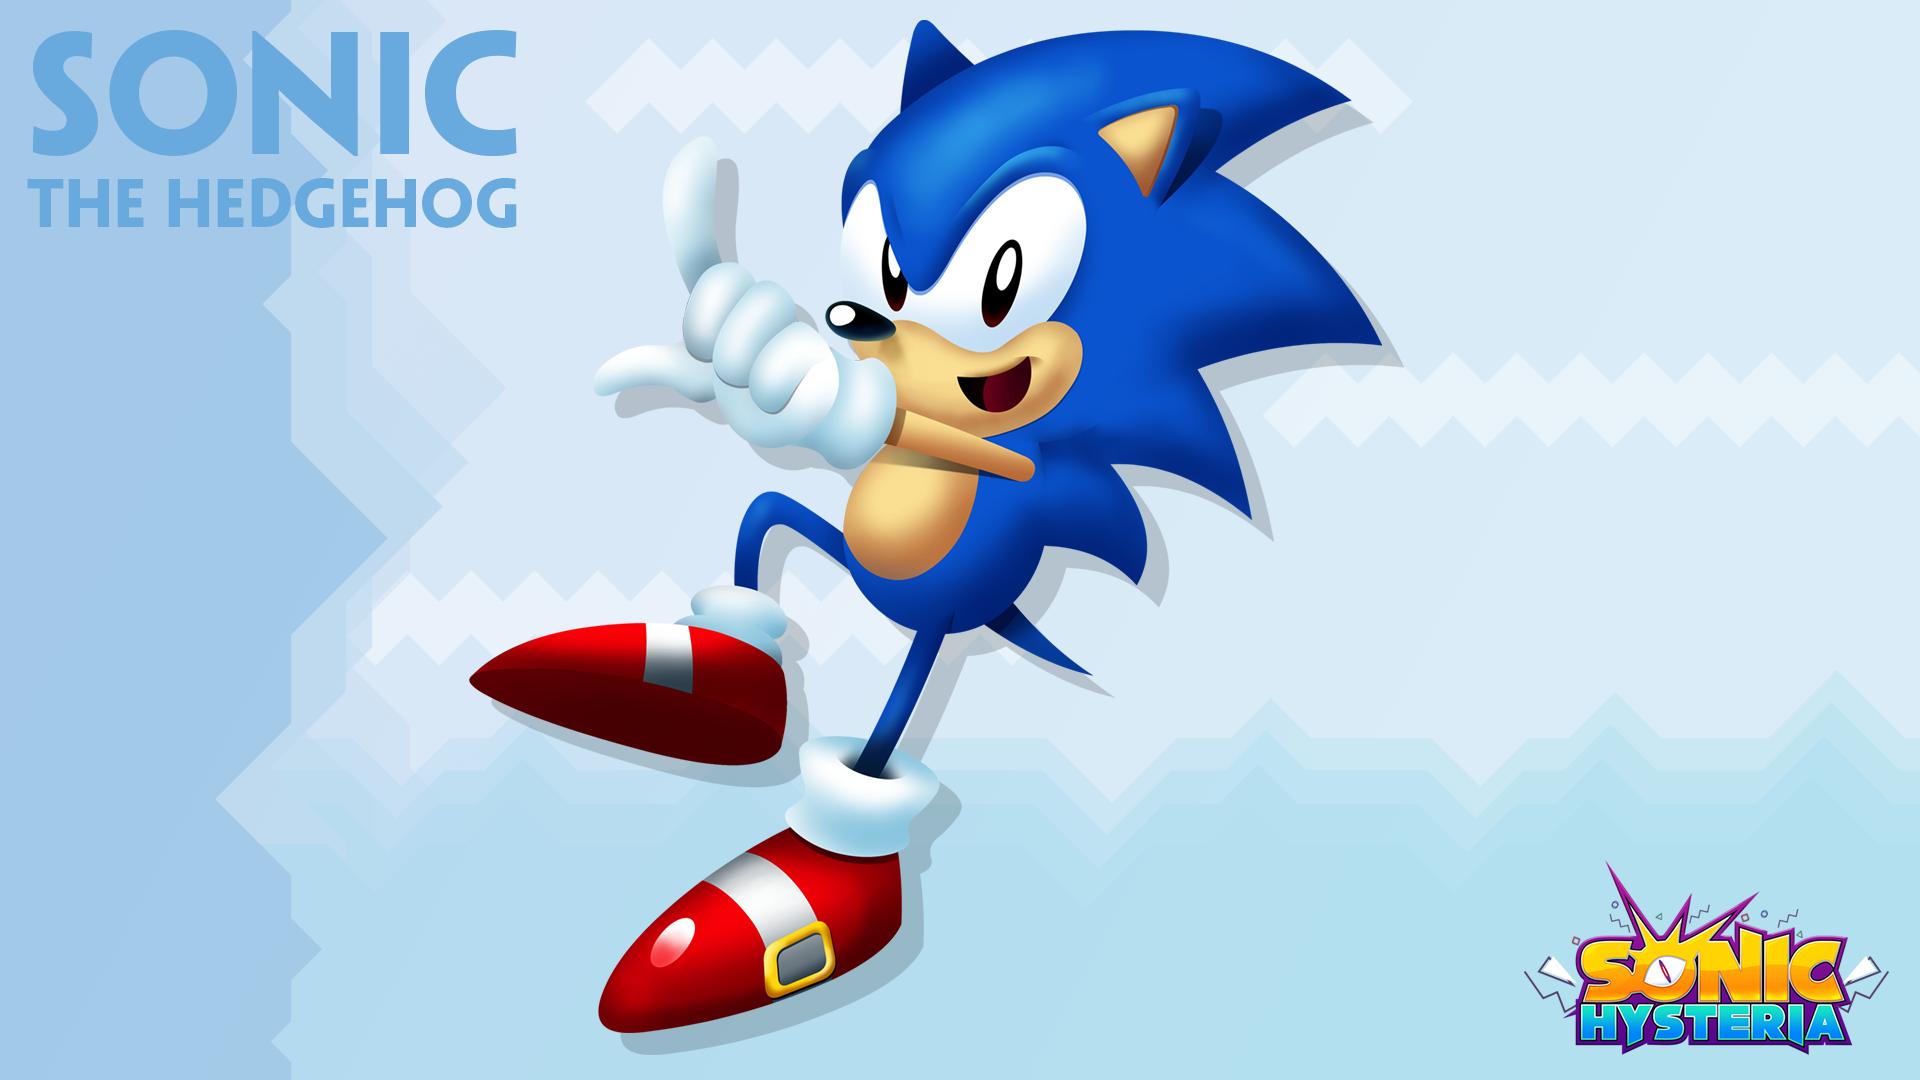 Sonic - Sonic Hysteria